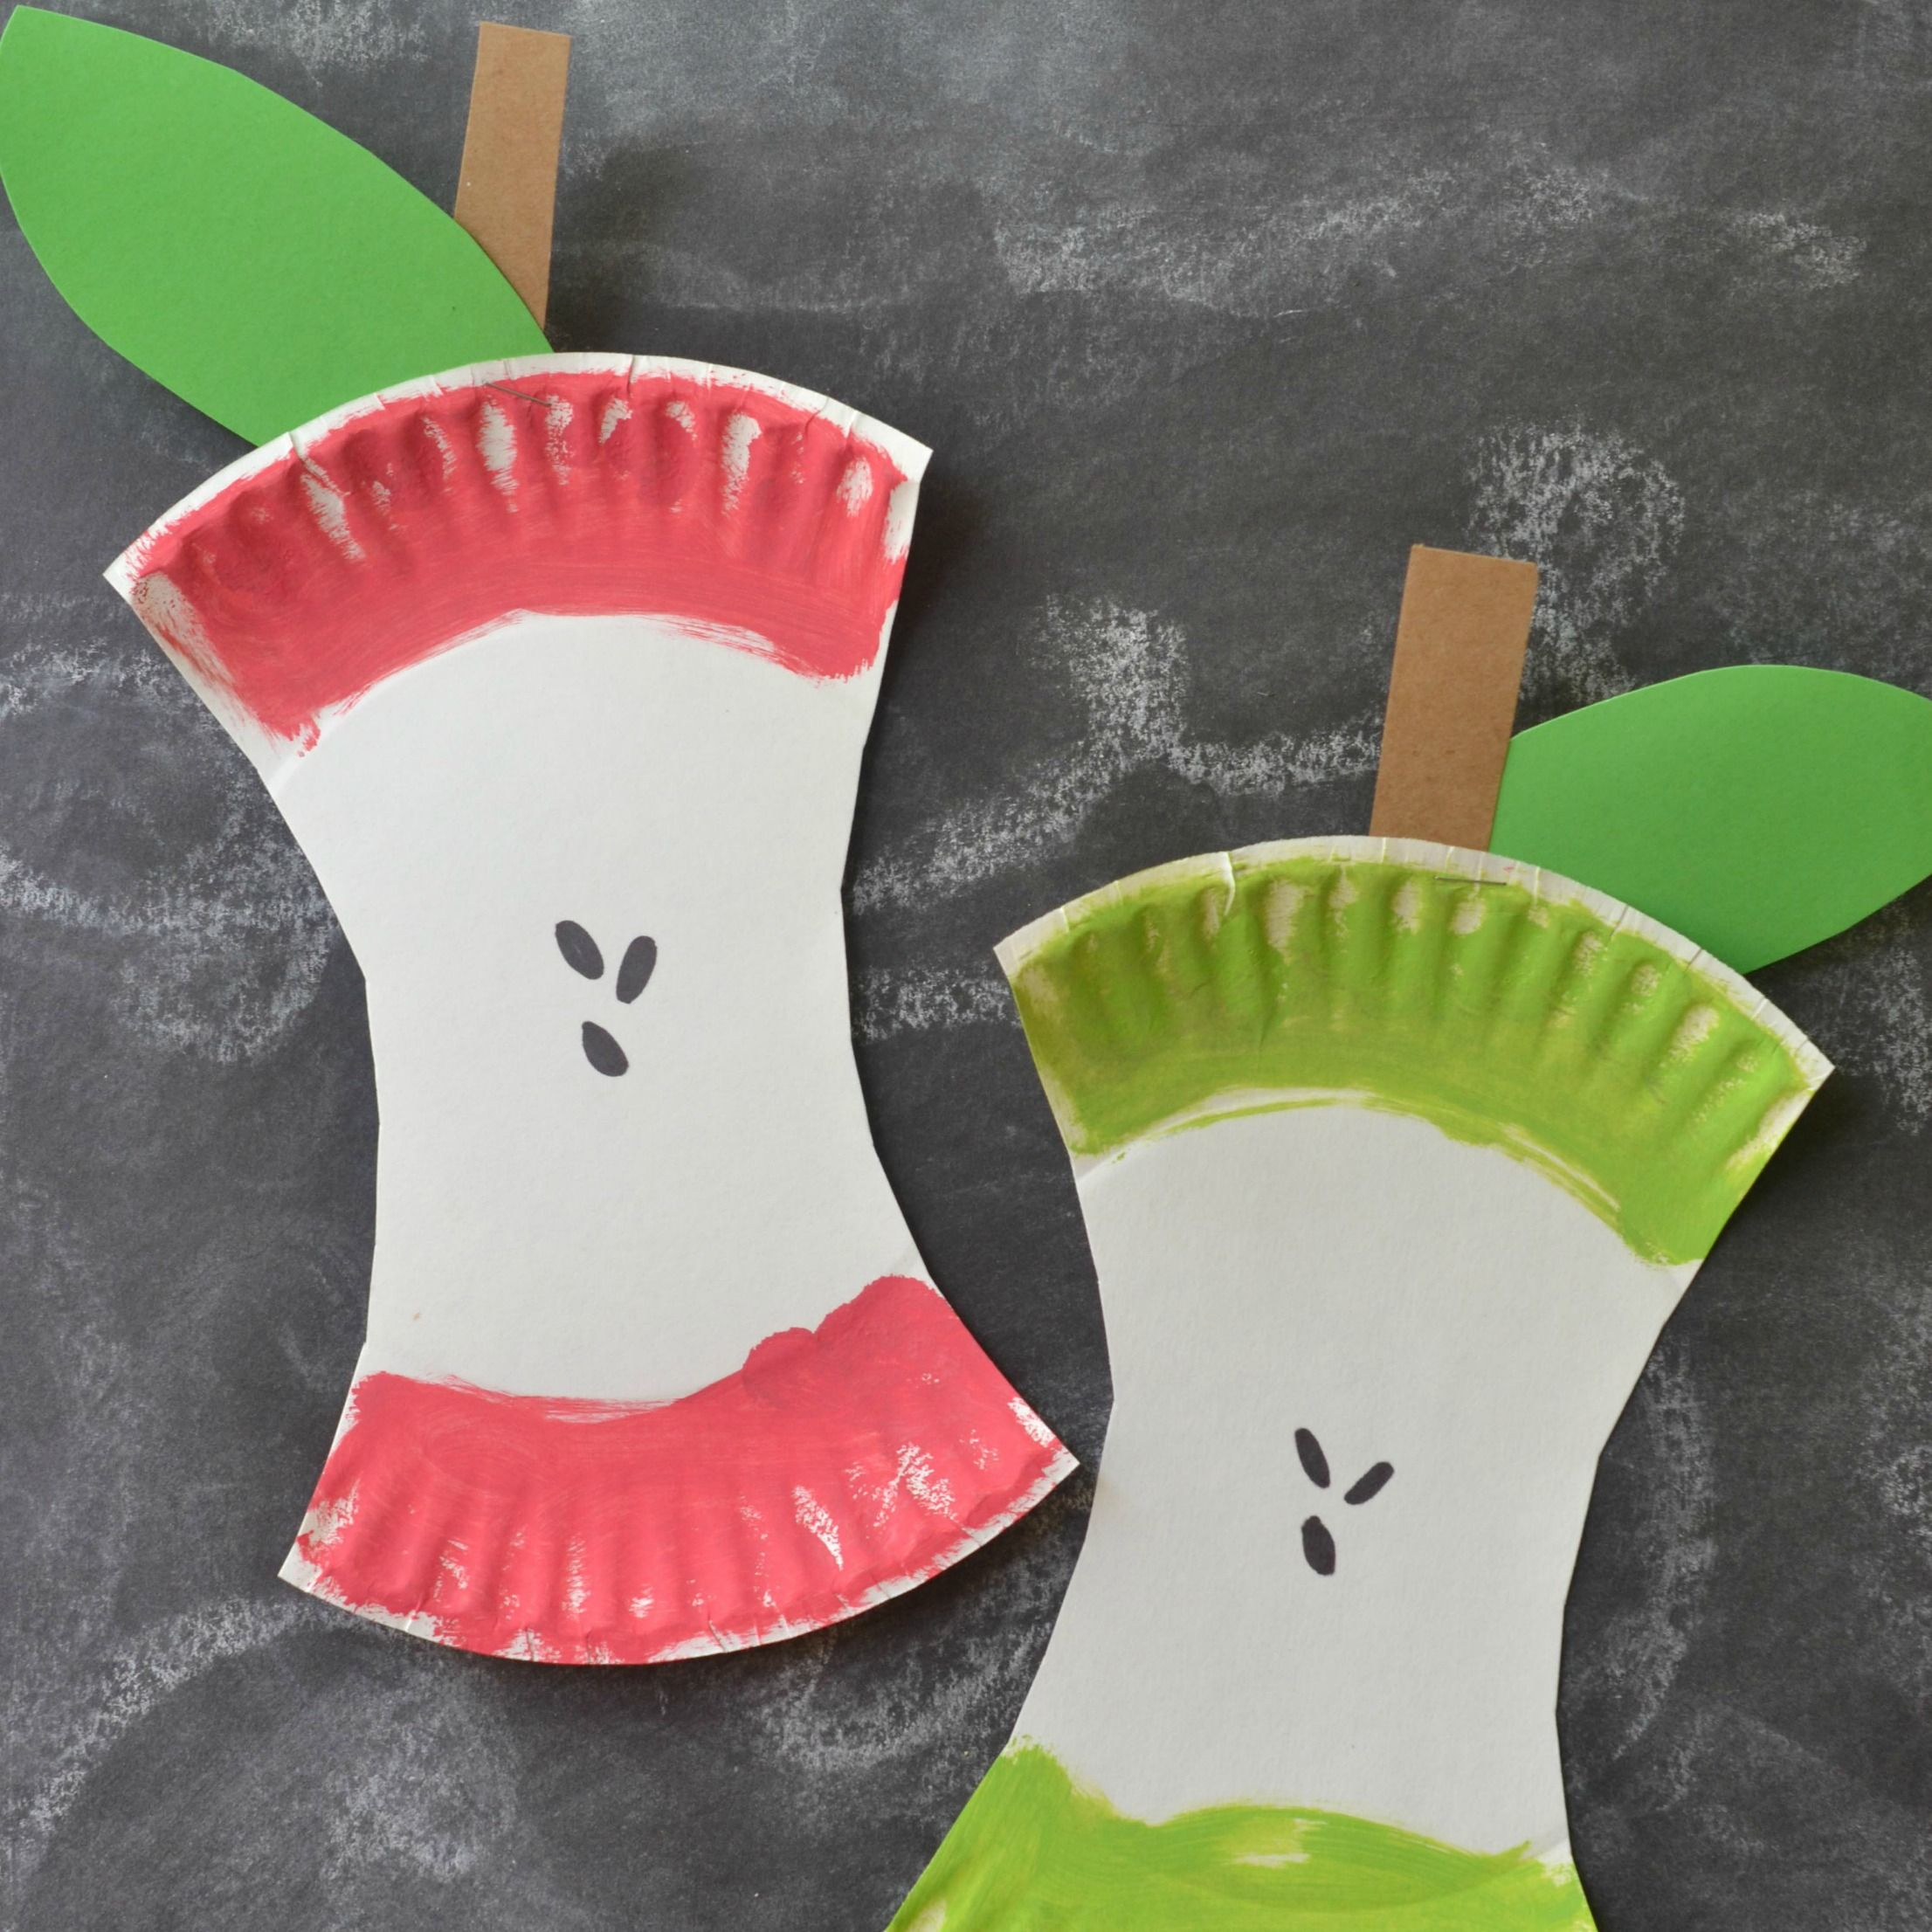 Kids Craft Project Paper Plate Apple Core & Kids Craft Project: Paper Plate Apple Core | Kids craft projects ...